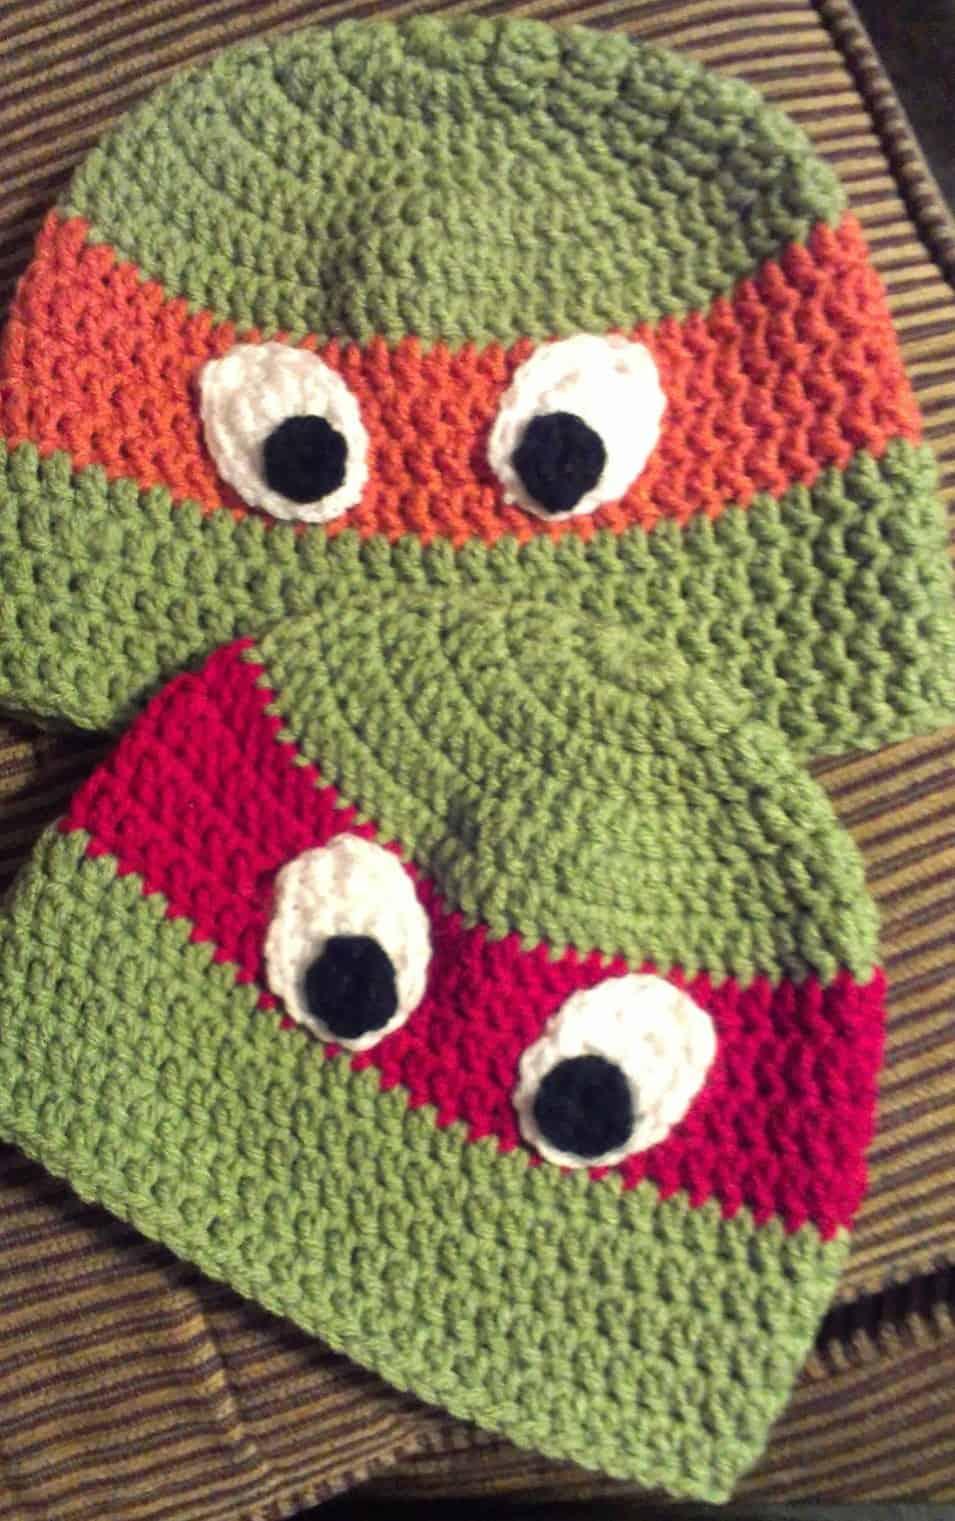 free crochet pattern for boys ninja turtles hat